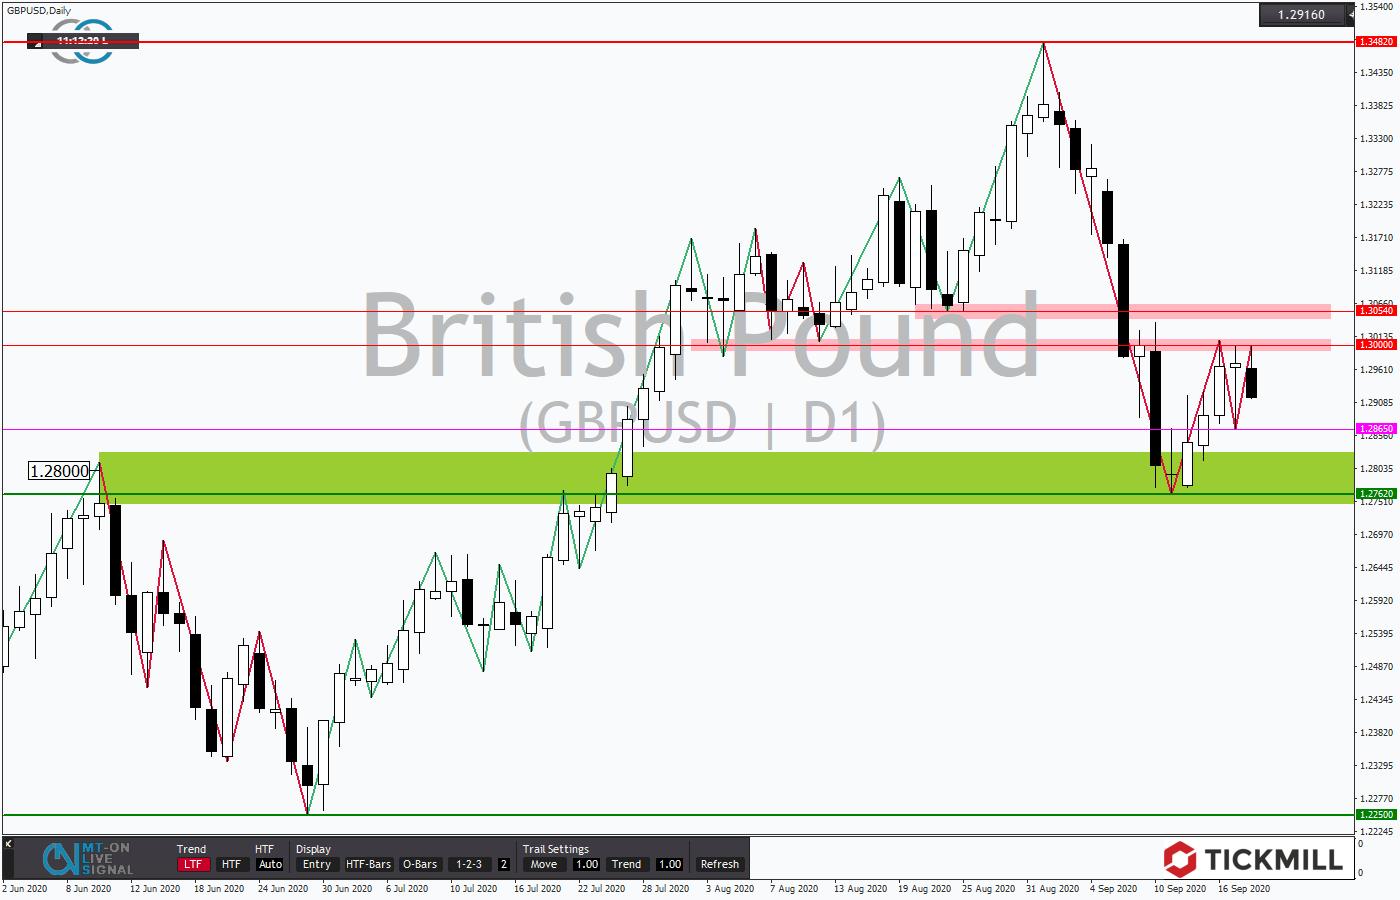 Tickmill-Analyse: Korrektur des GBPUSD im Tageschart